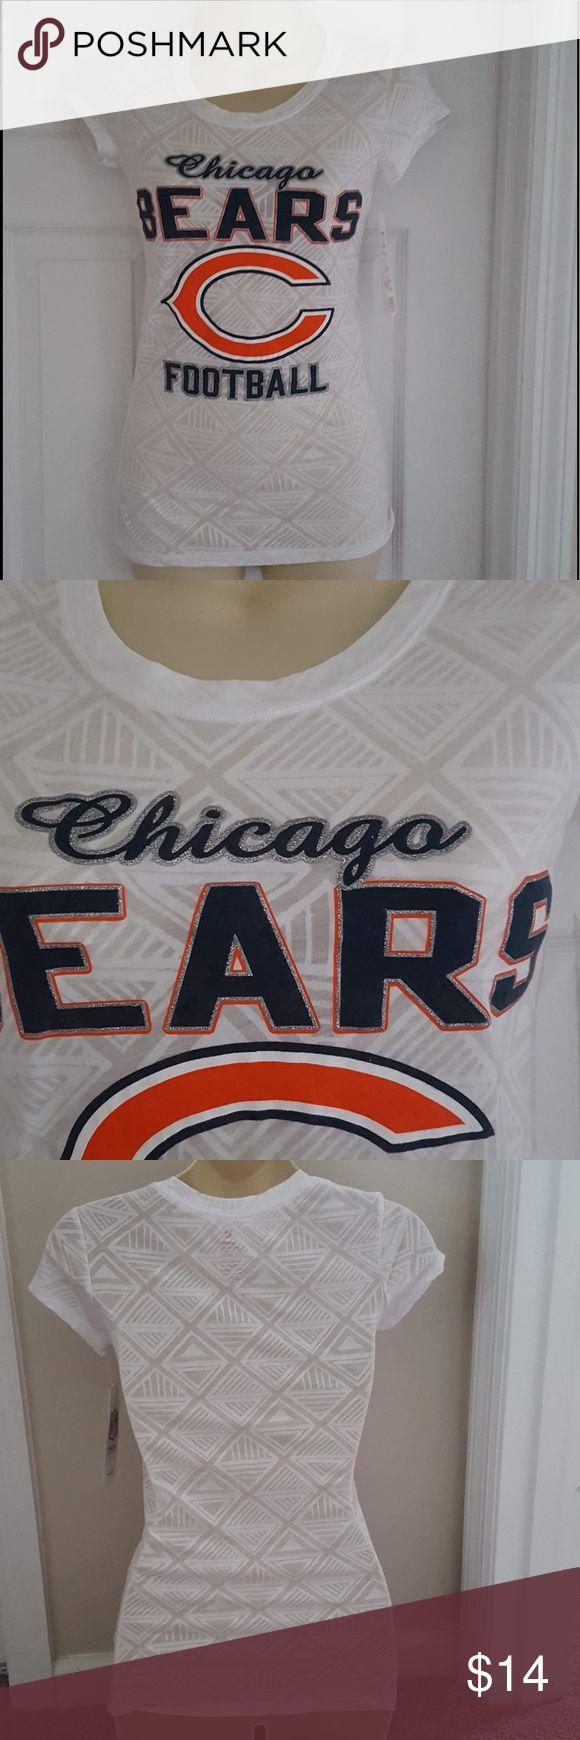 Chicago bears sheer short sleeve tee shirt Bears fan tshirt sheer graphic tee with team logo NFL apparel Tops Tees - Short Sleeve